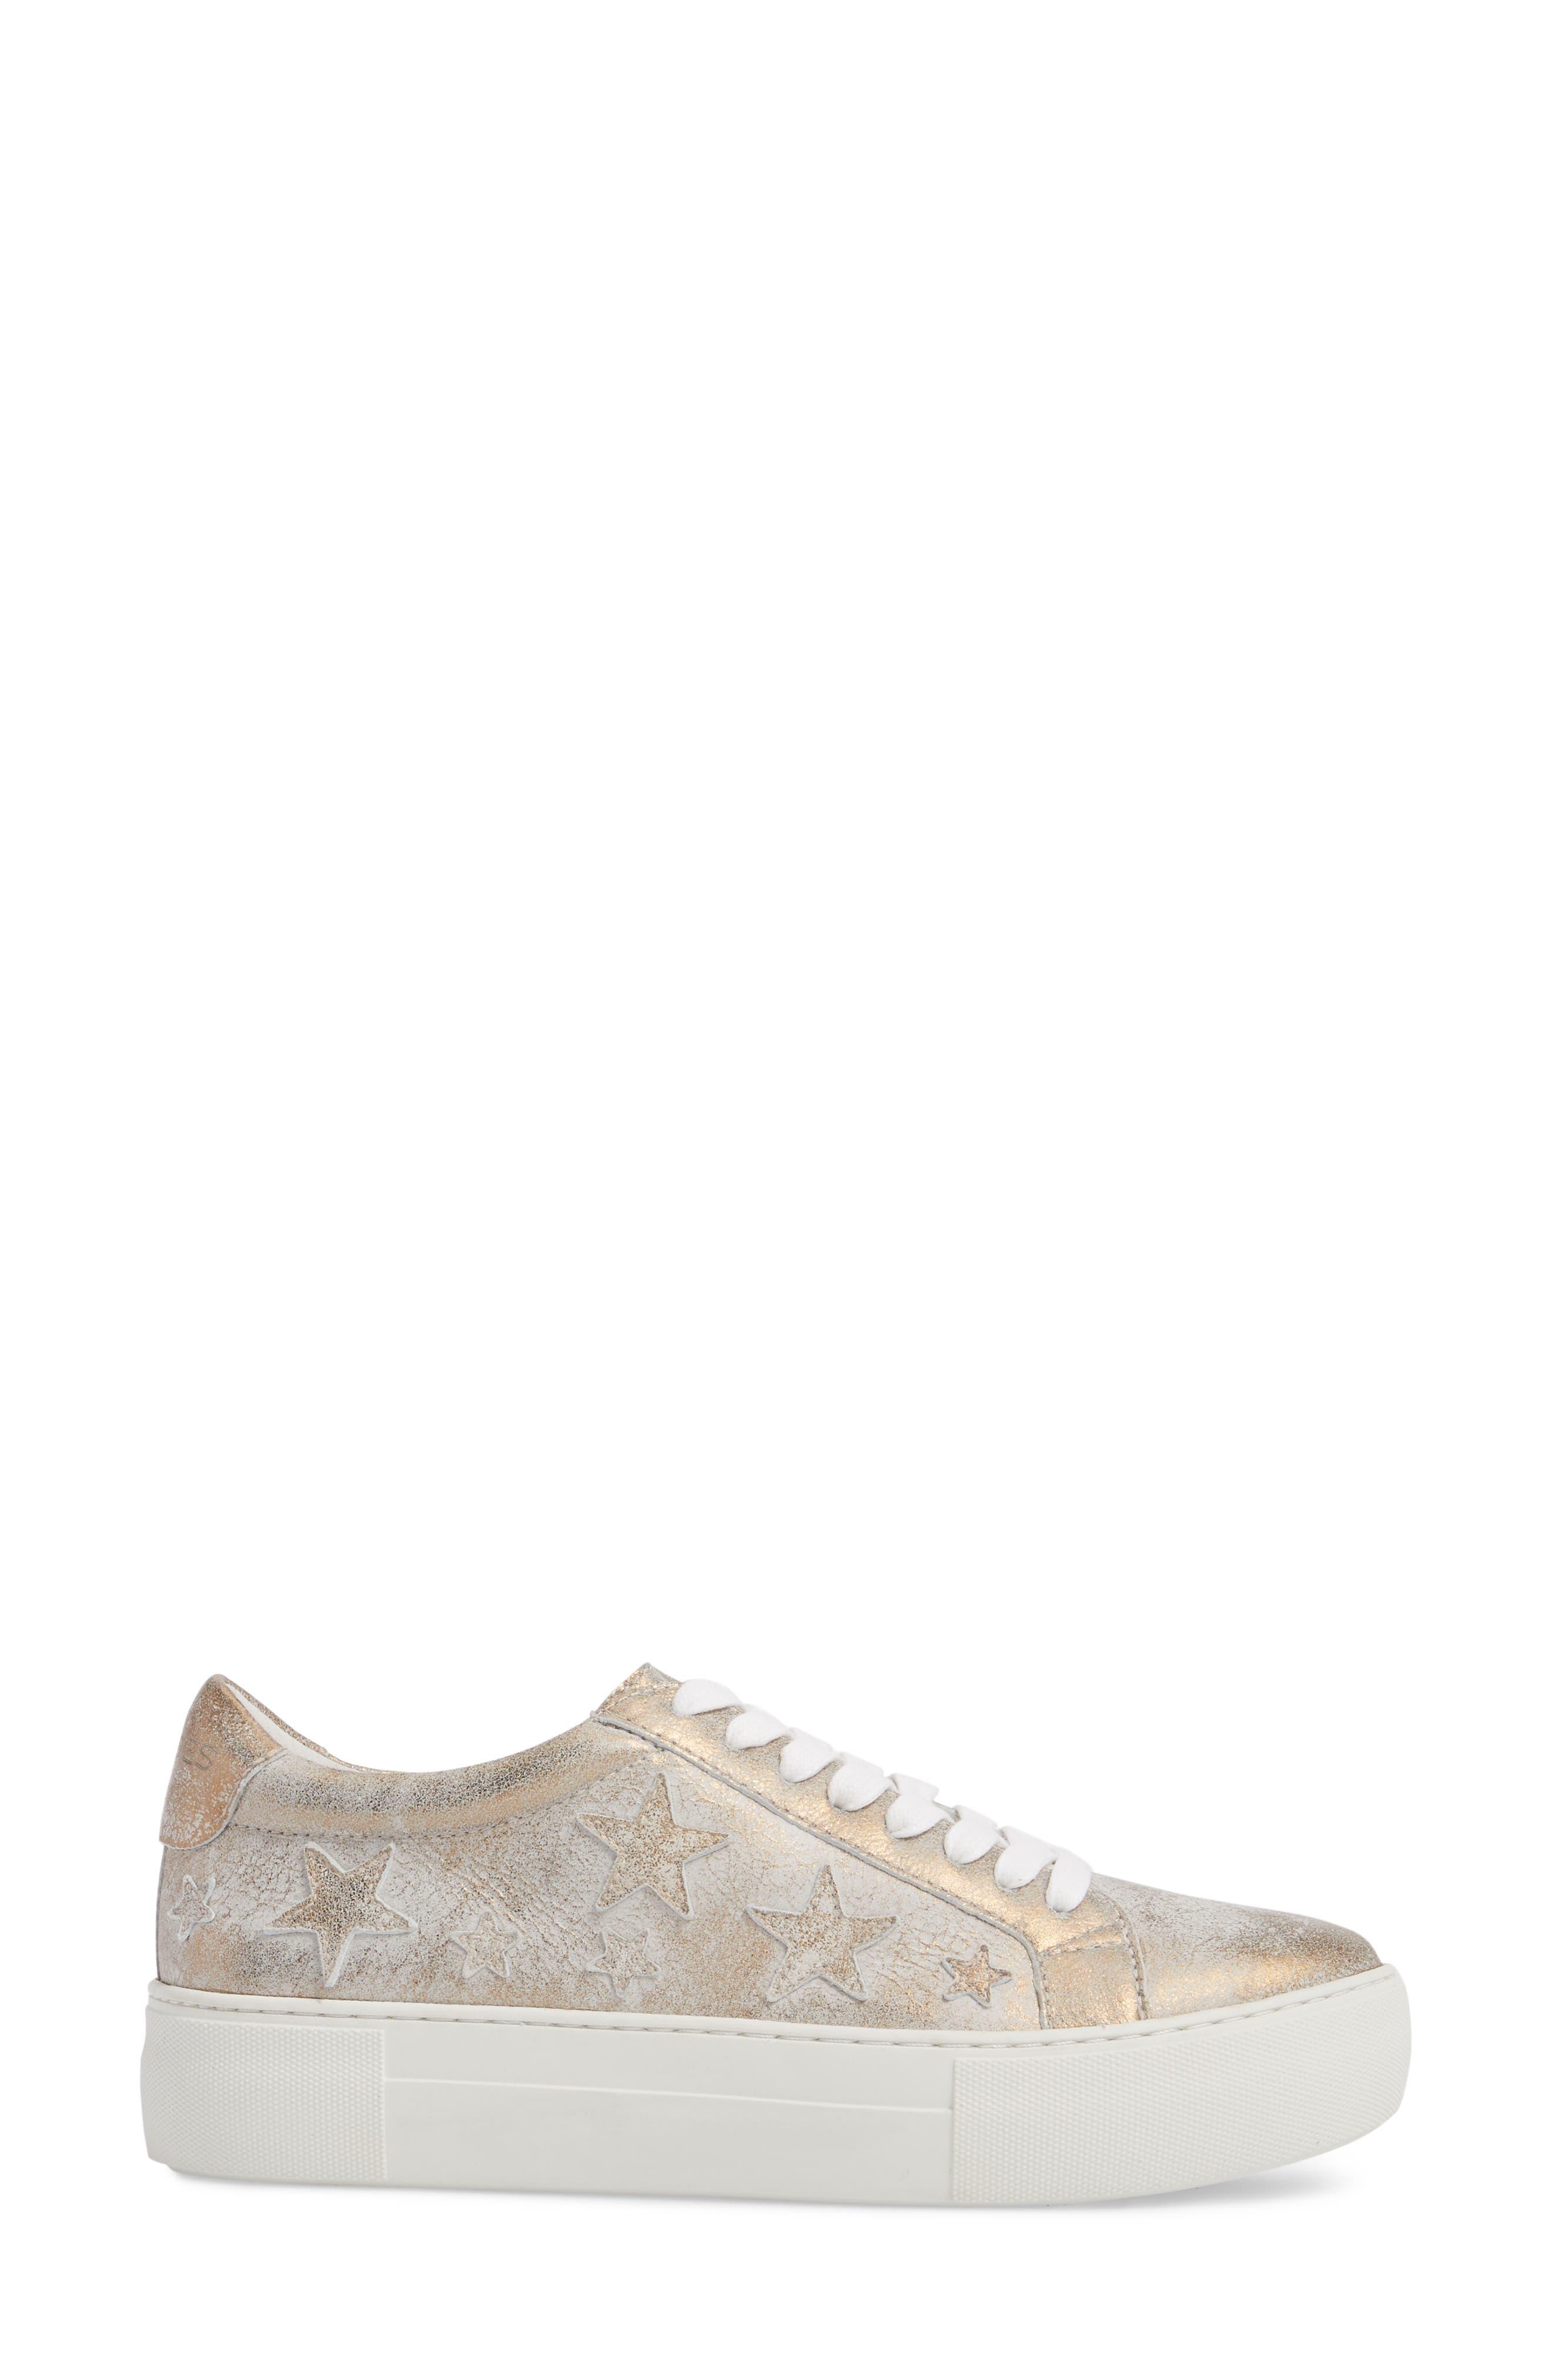 Apostle Sneaker,                             Alternate thumbnail 3, color,                             Bronze Suede